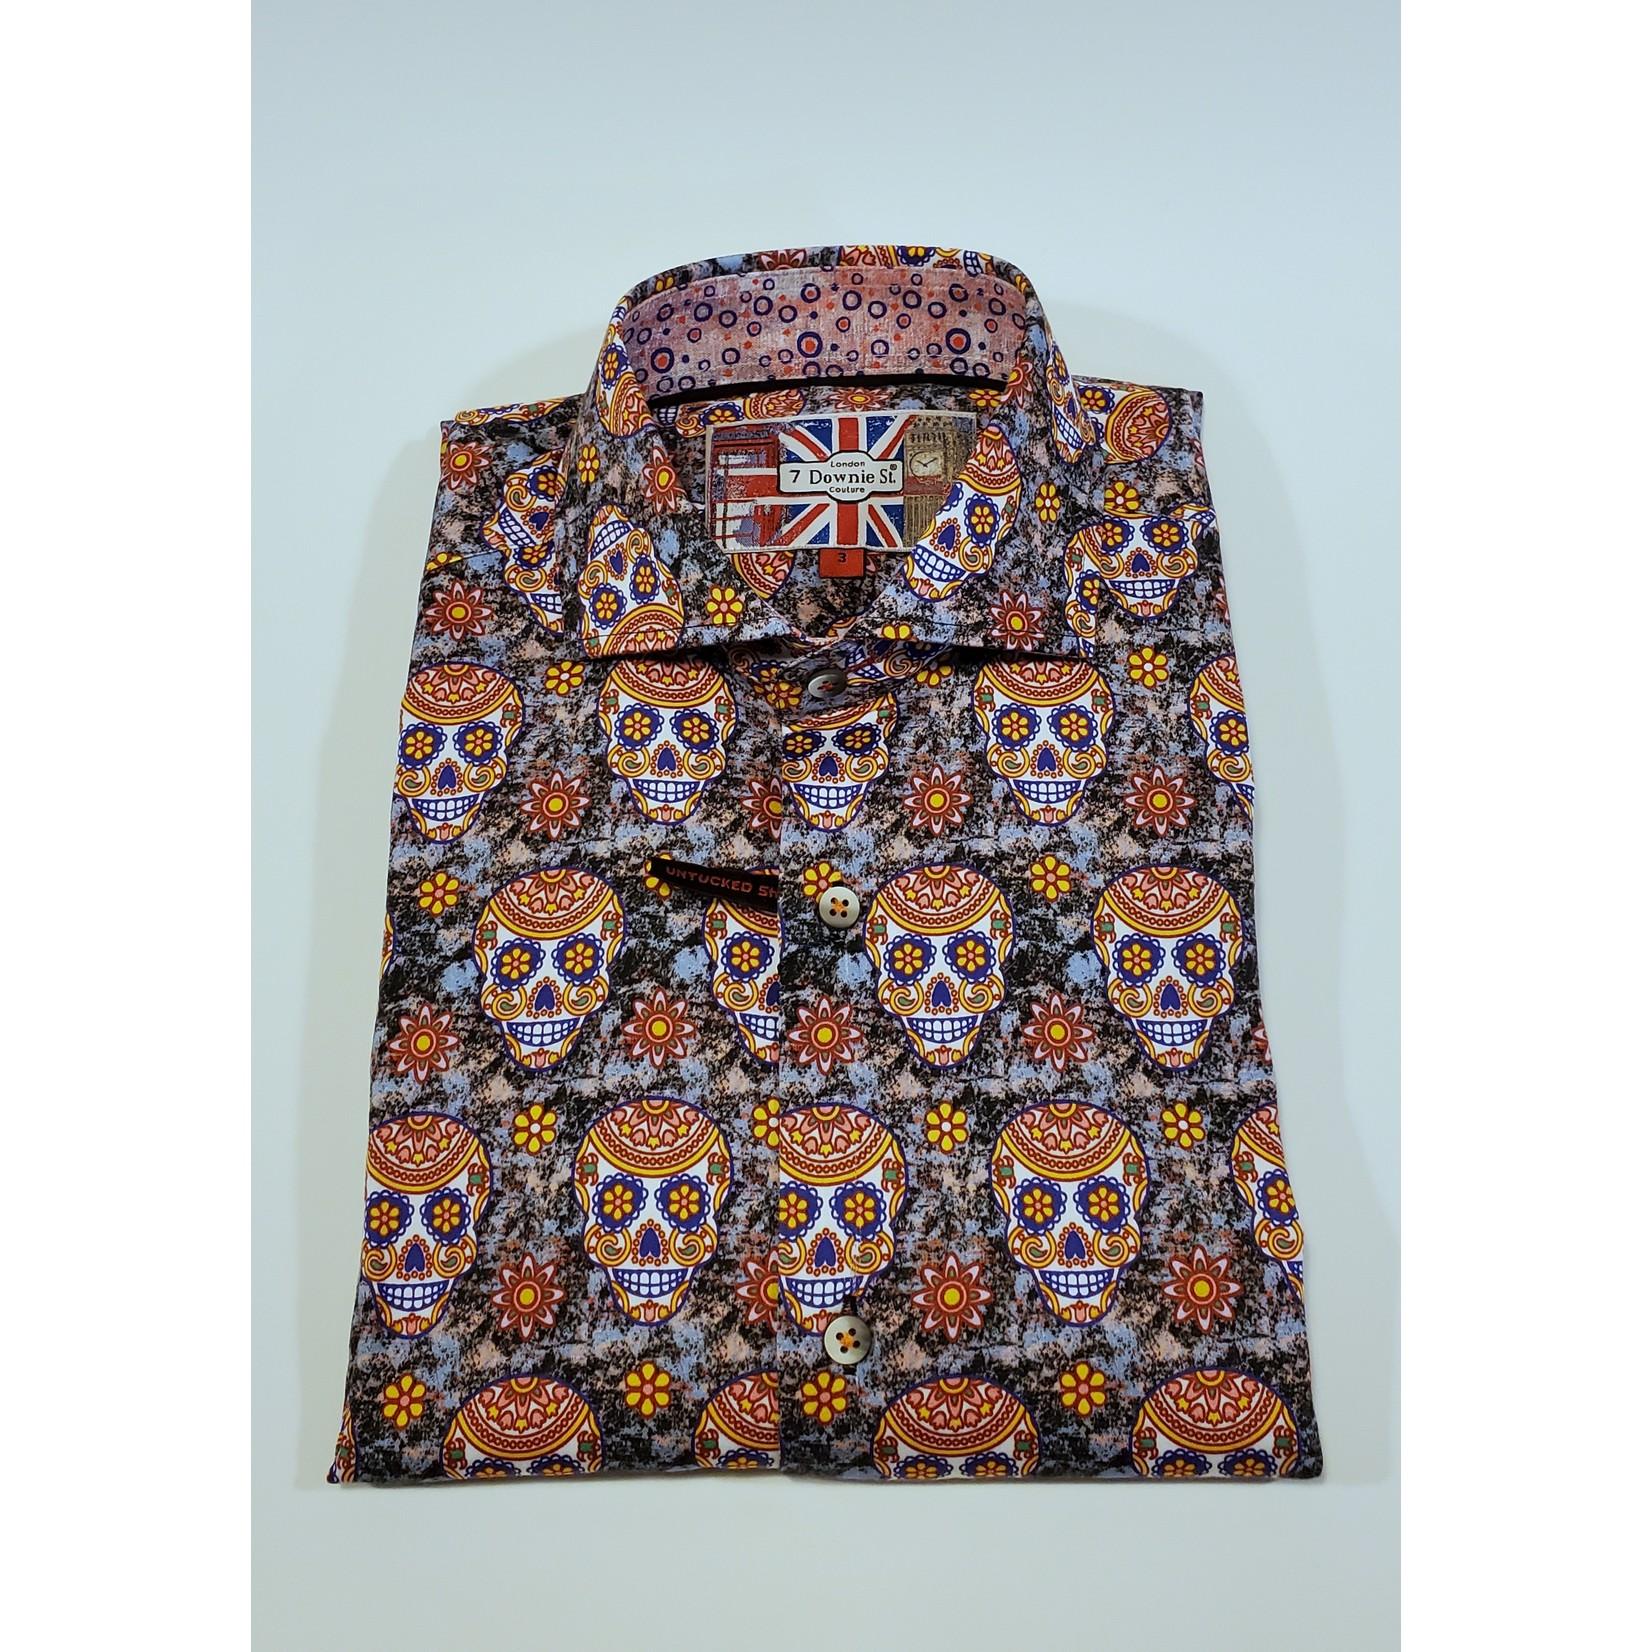 7 Downie St. 7 Downie St Short-Sleeve Spring Sportshirts